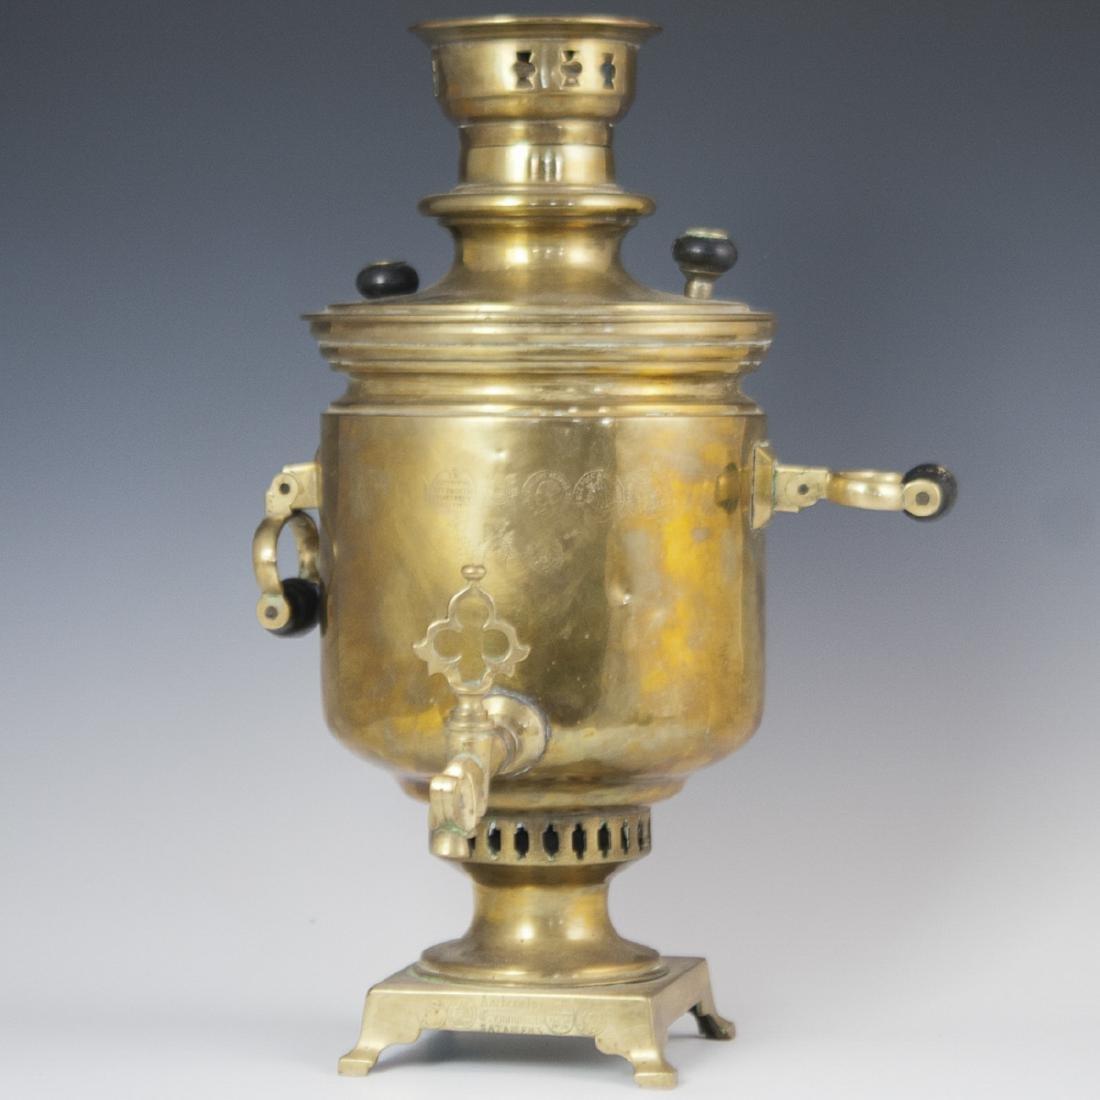 Antique Alexander Stepanovich Brass Samovar